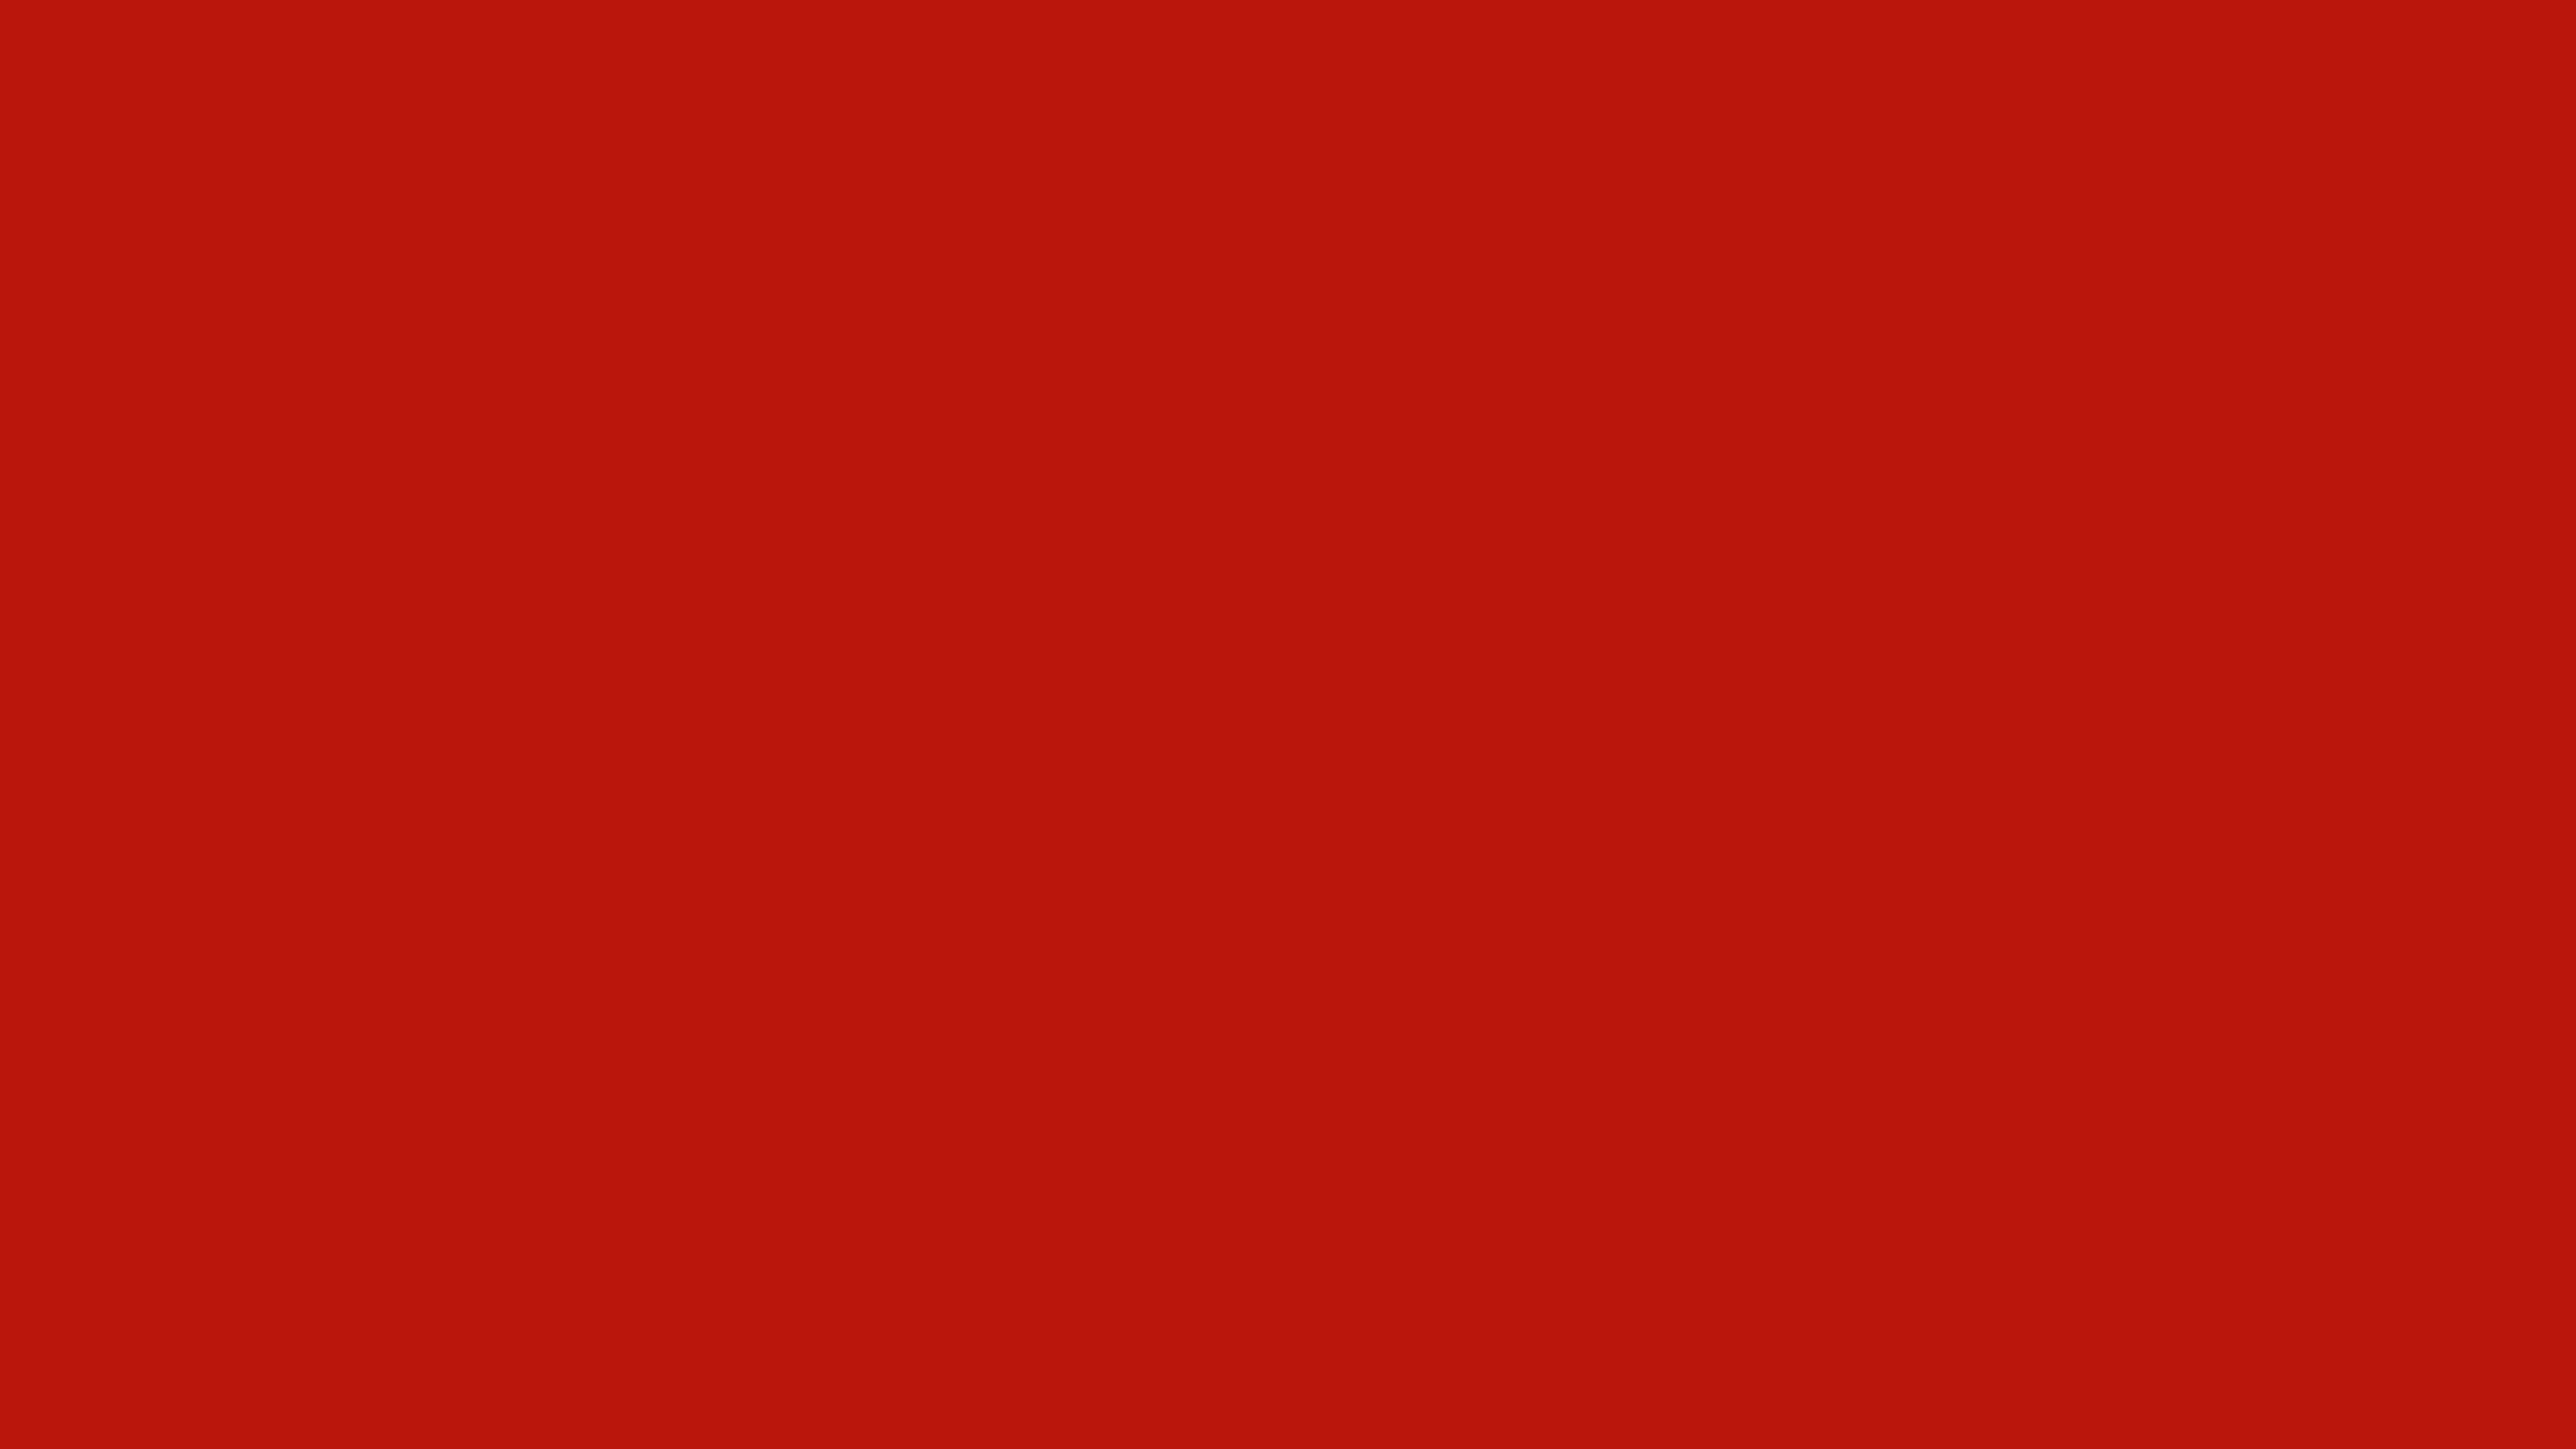 4096x2304 International Orange Engineering Solid Color Background